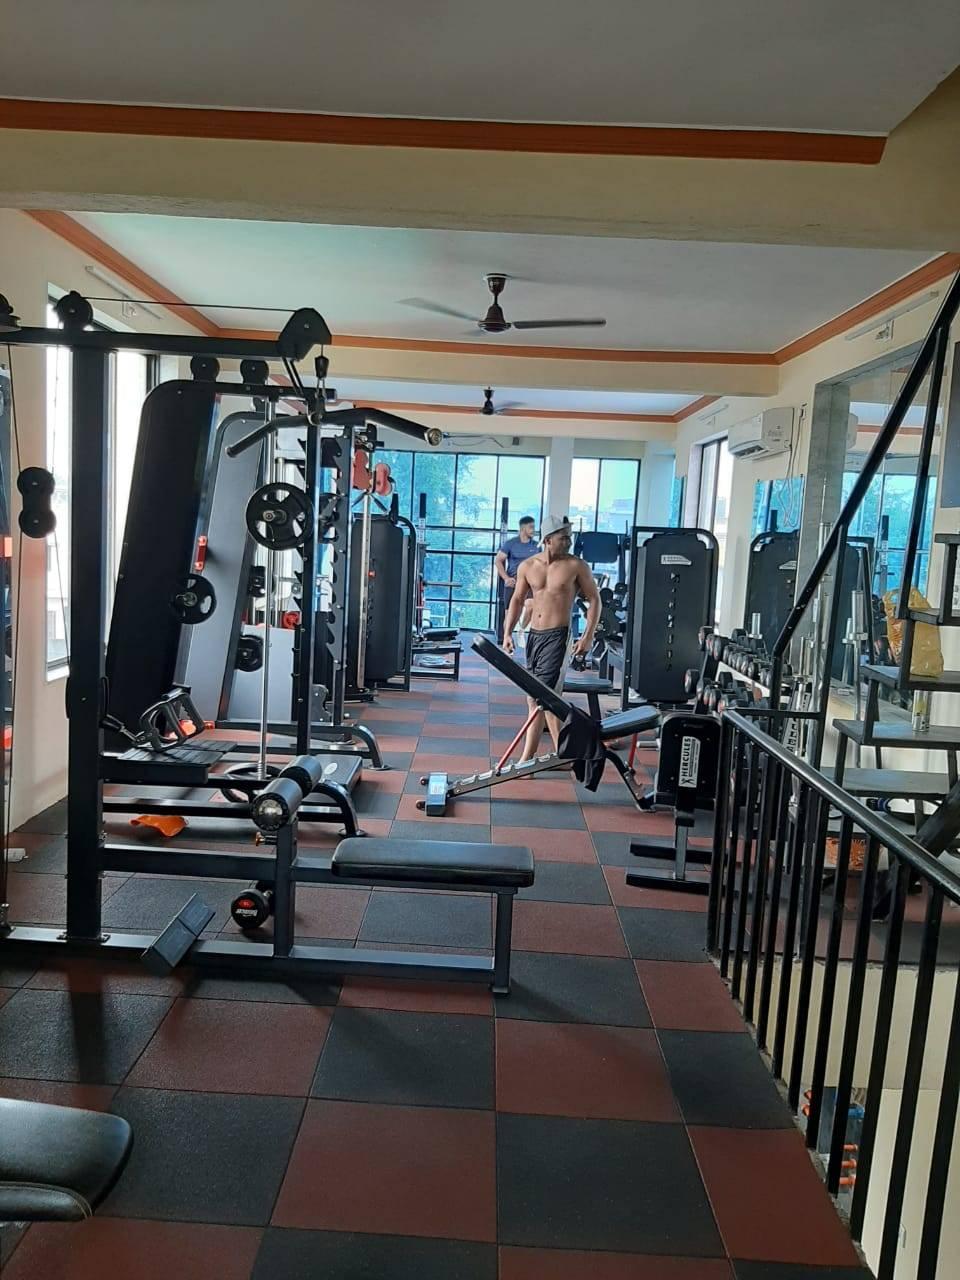 Valsad-Garib-Nawaz-Society-DFC-Decent-Fitness-Centre_384_Mzg0_MTIxMg